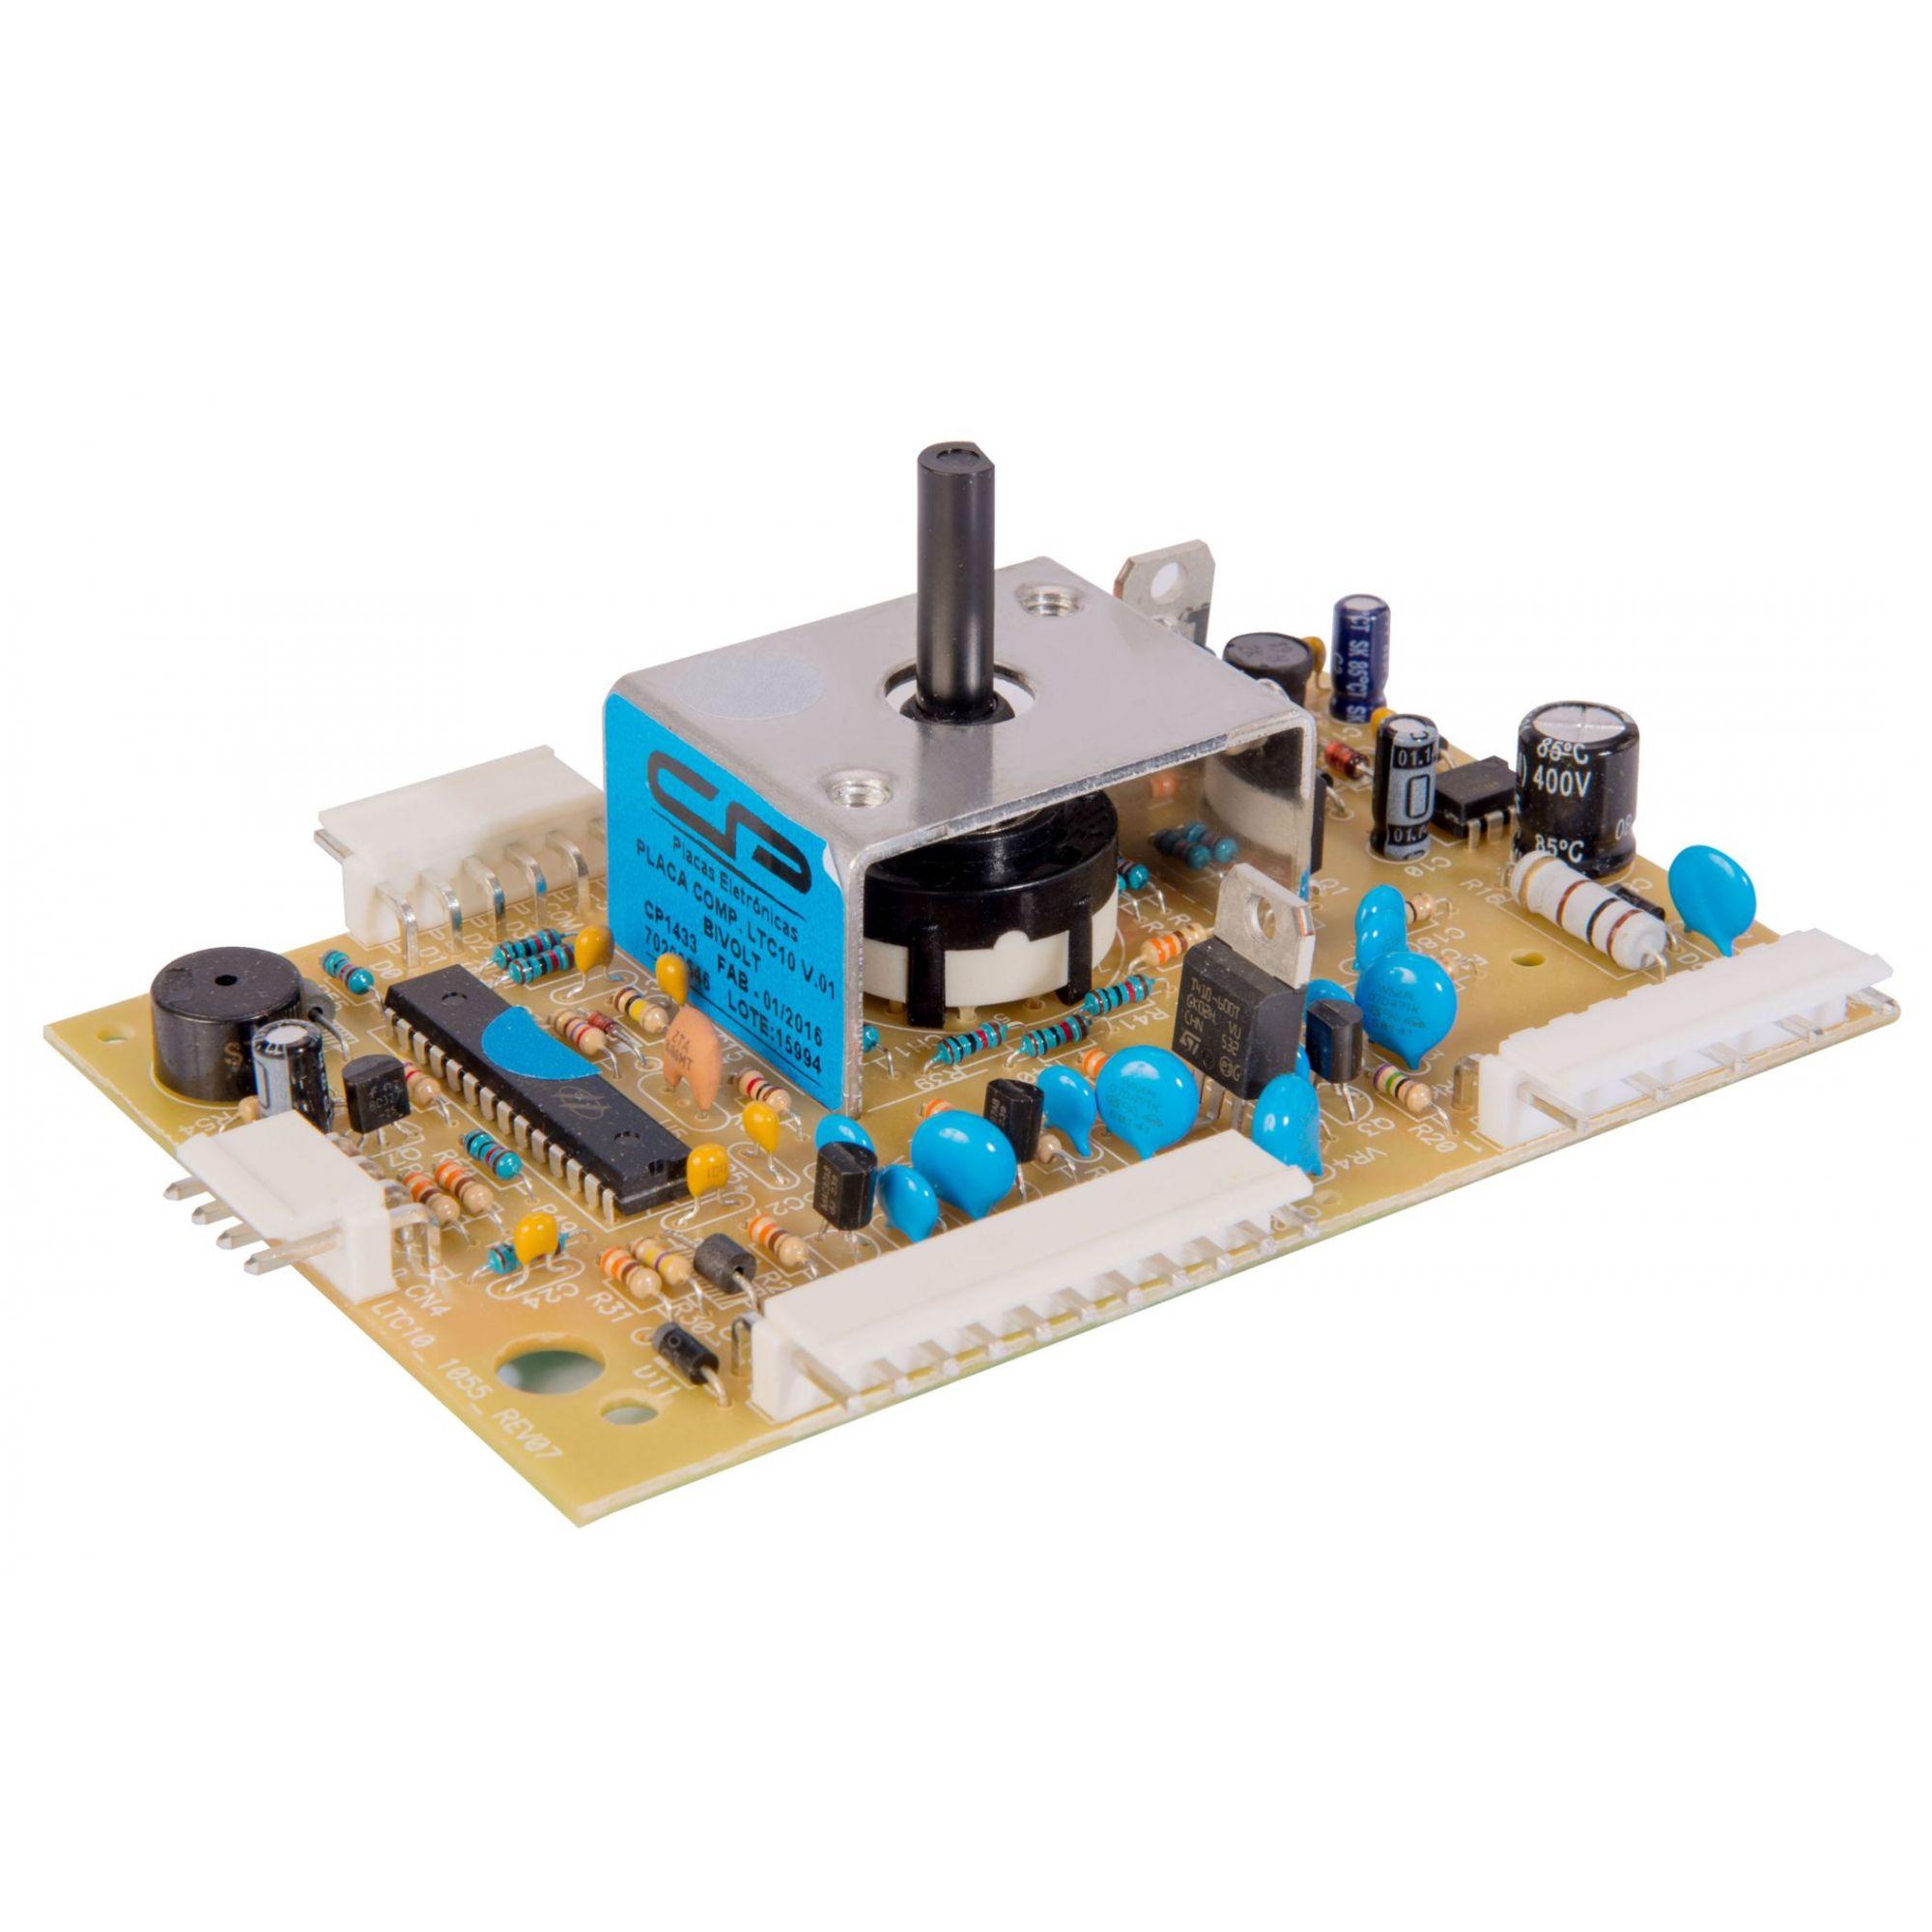 Placa Compatível Lavadora Electrolux LTC10 Versão 1 - Bivolt